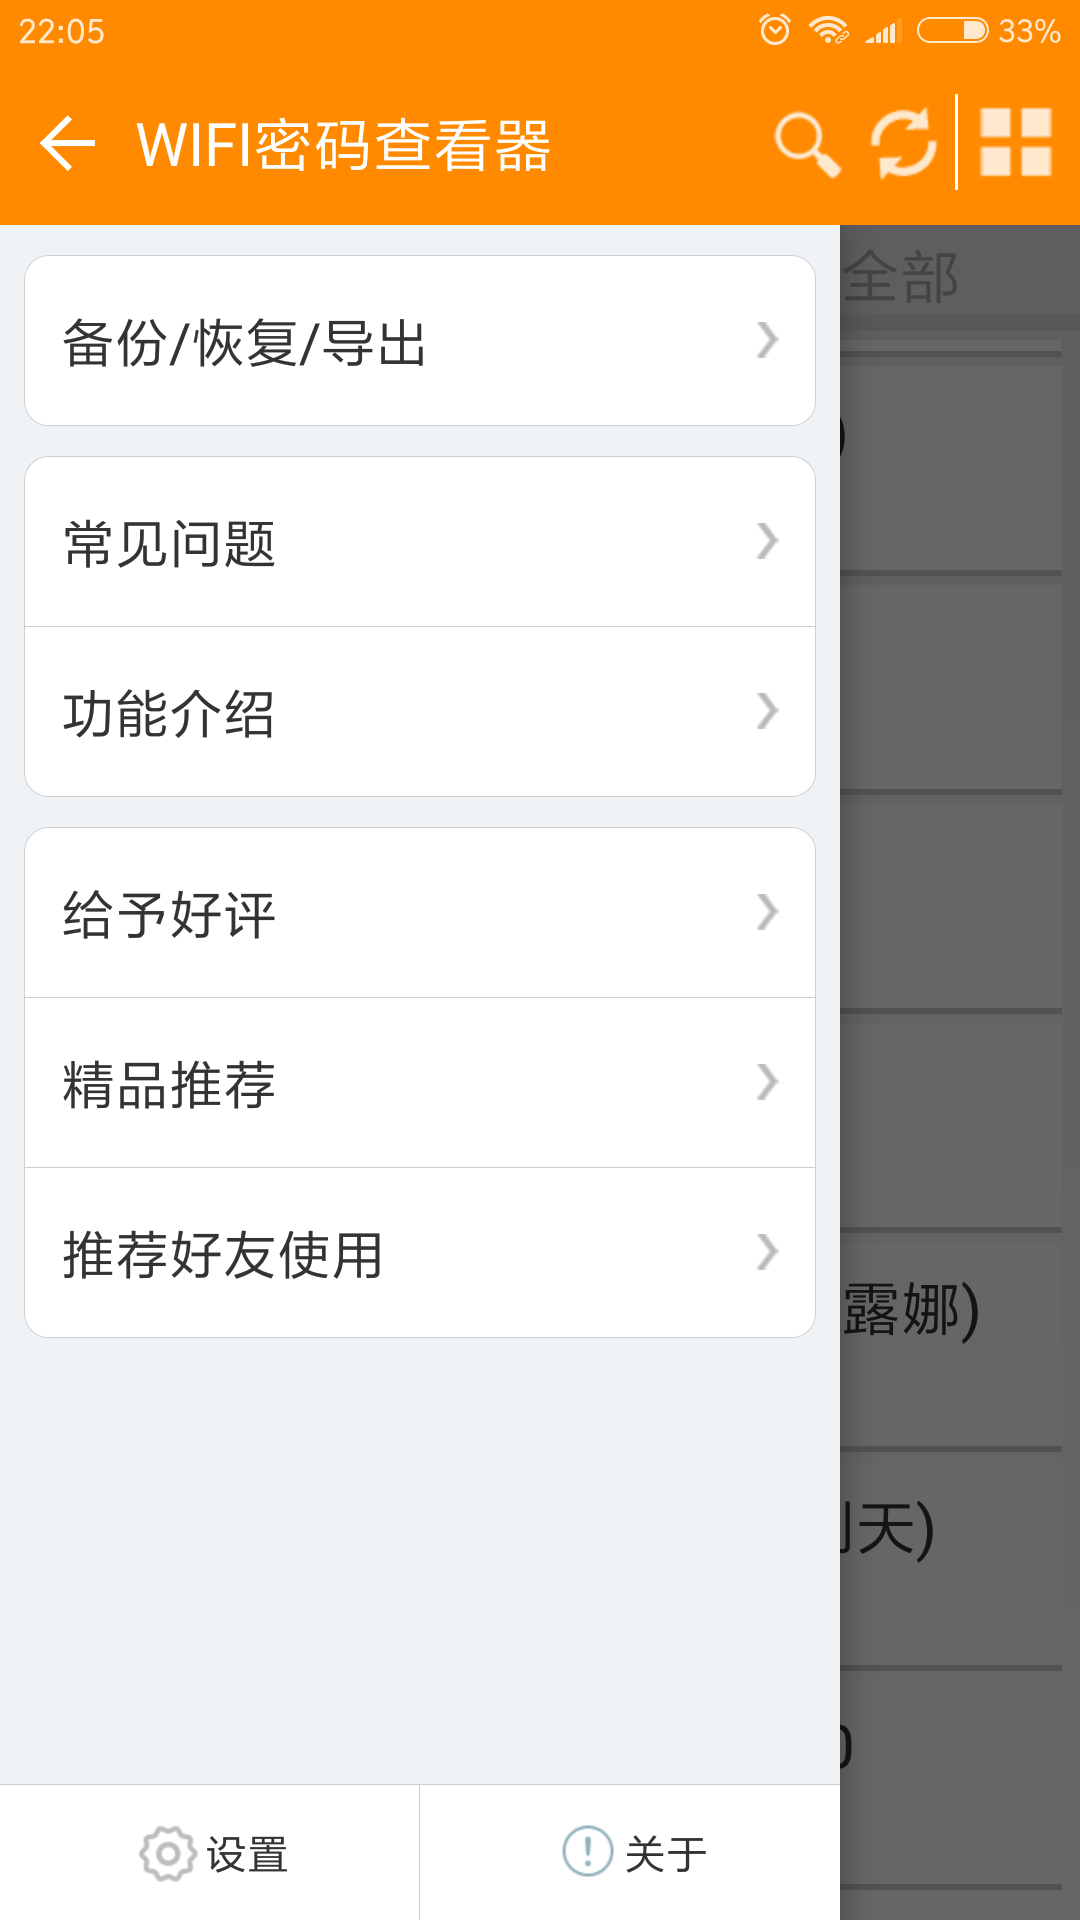 wifi伴侣_WiFi密码查看器(com.alex.lookwifipassword) - 4.0 - 应用 - 酷安网